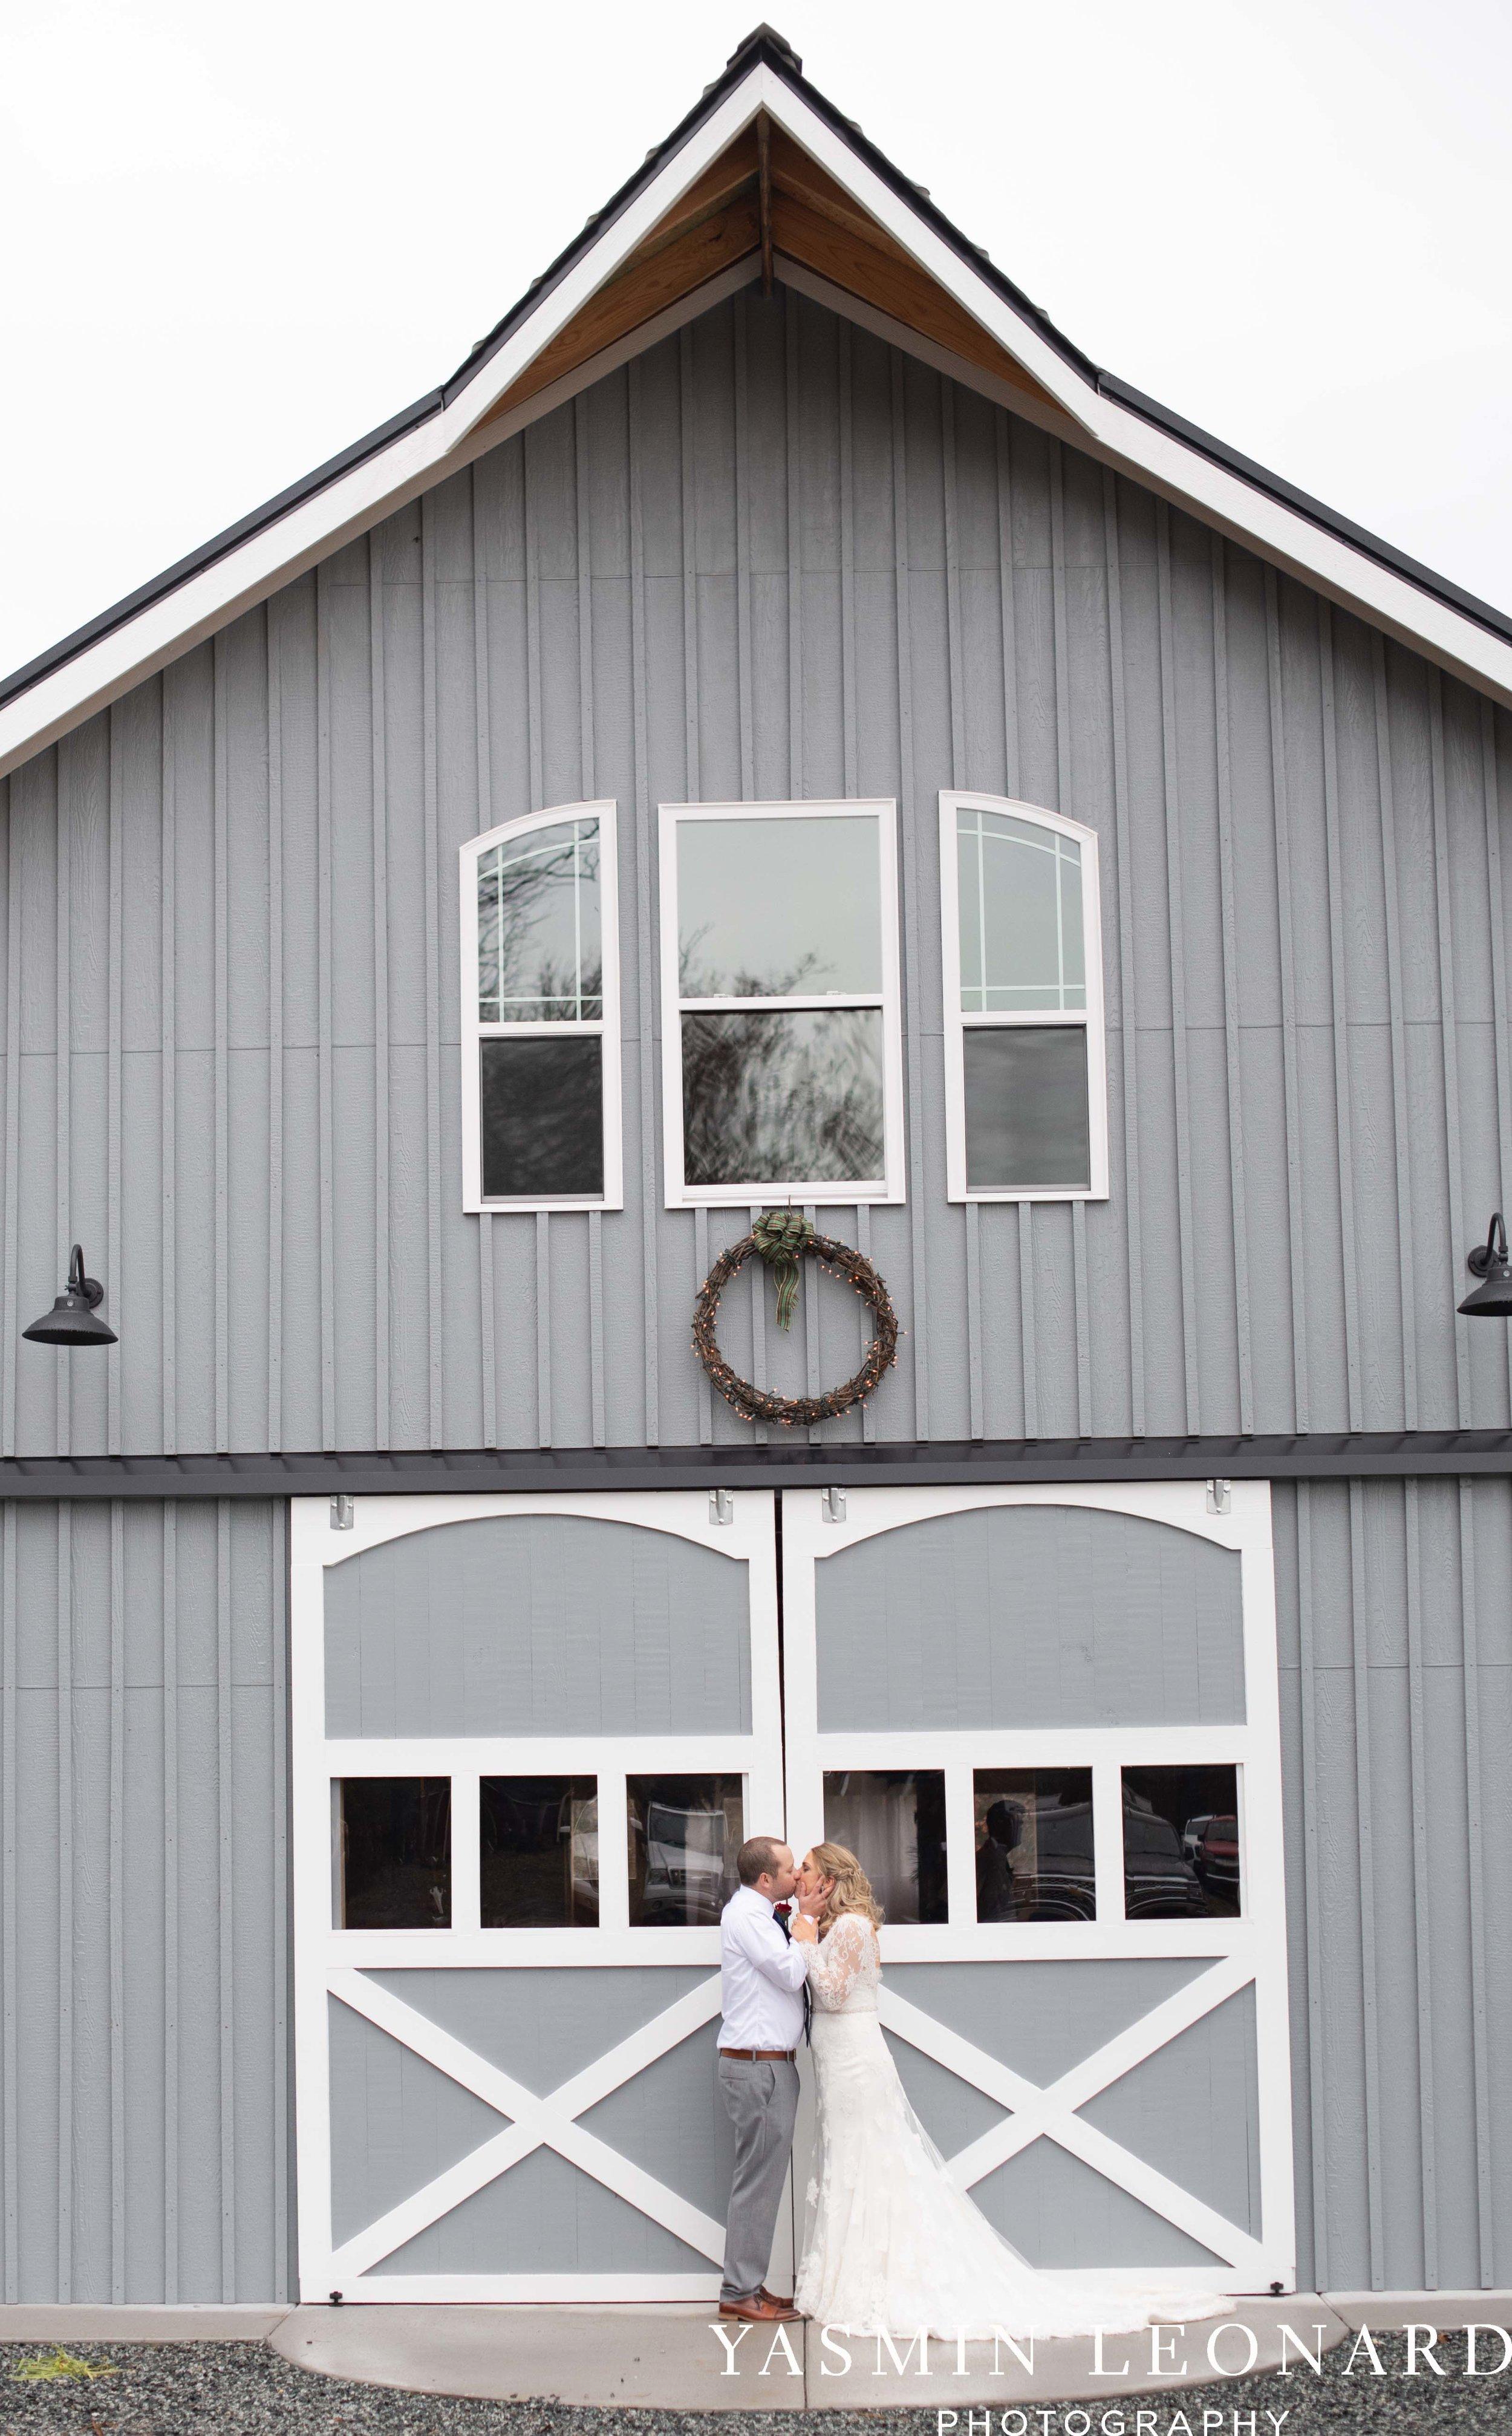 Secret Meadows at Green Dell Farm, NC Barns, NC Wedding Venues, Triad, NC, NC Wedding Photography, Triad Wedding Venues, Affordable Wedding Venues, NEW Wedding Venues, Christmas Weddings-35.jpg